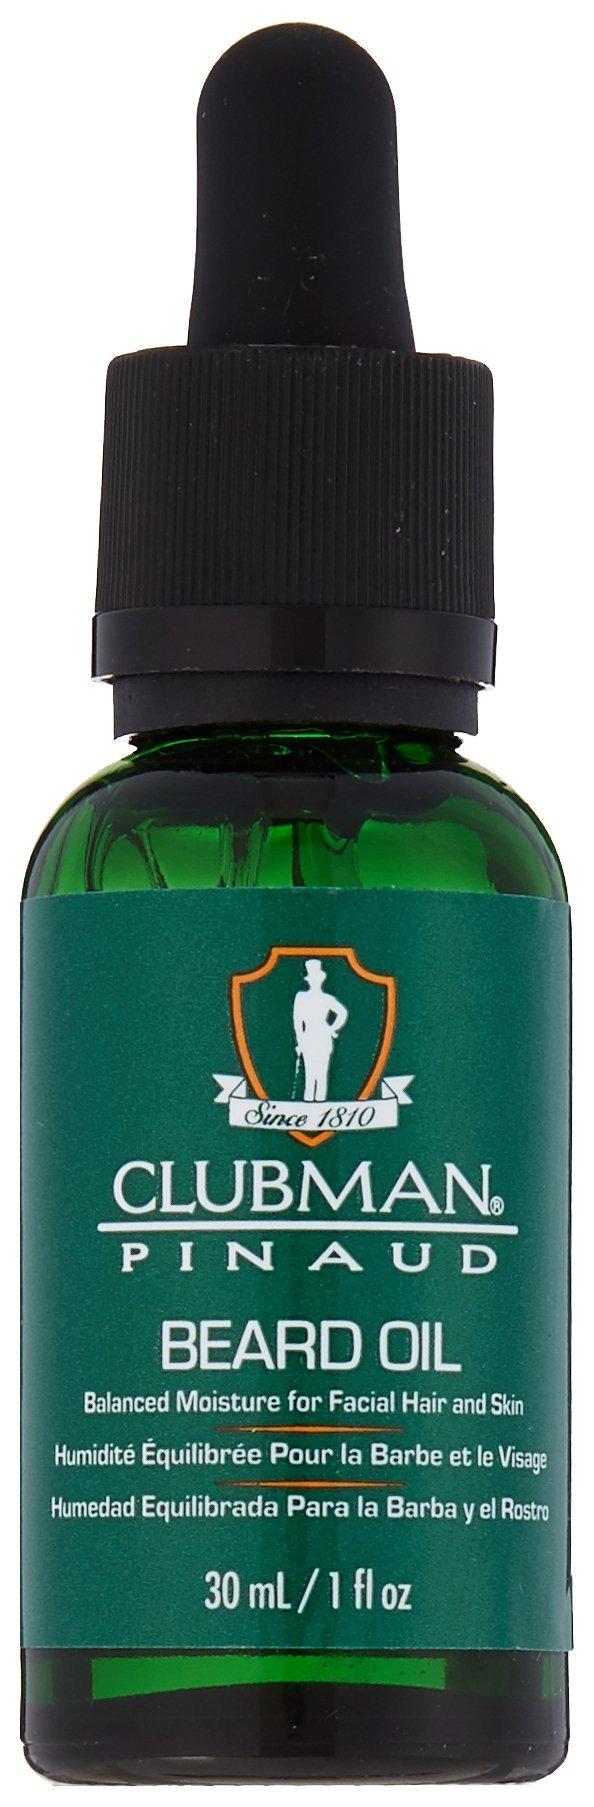 Clubman Beard Oil, 1 fl. oz.